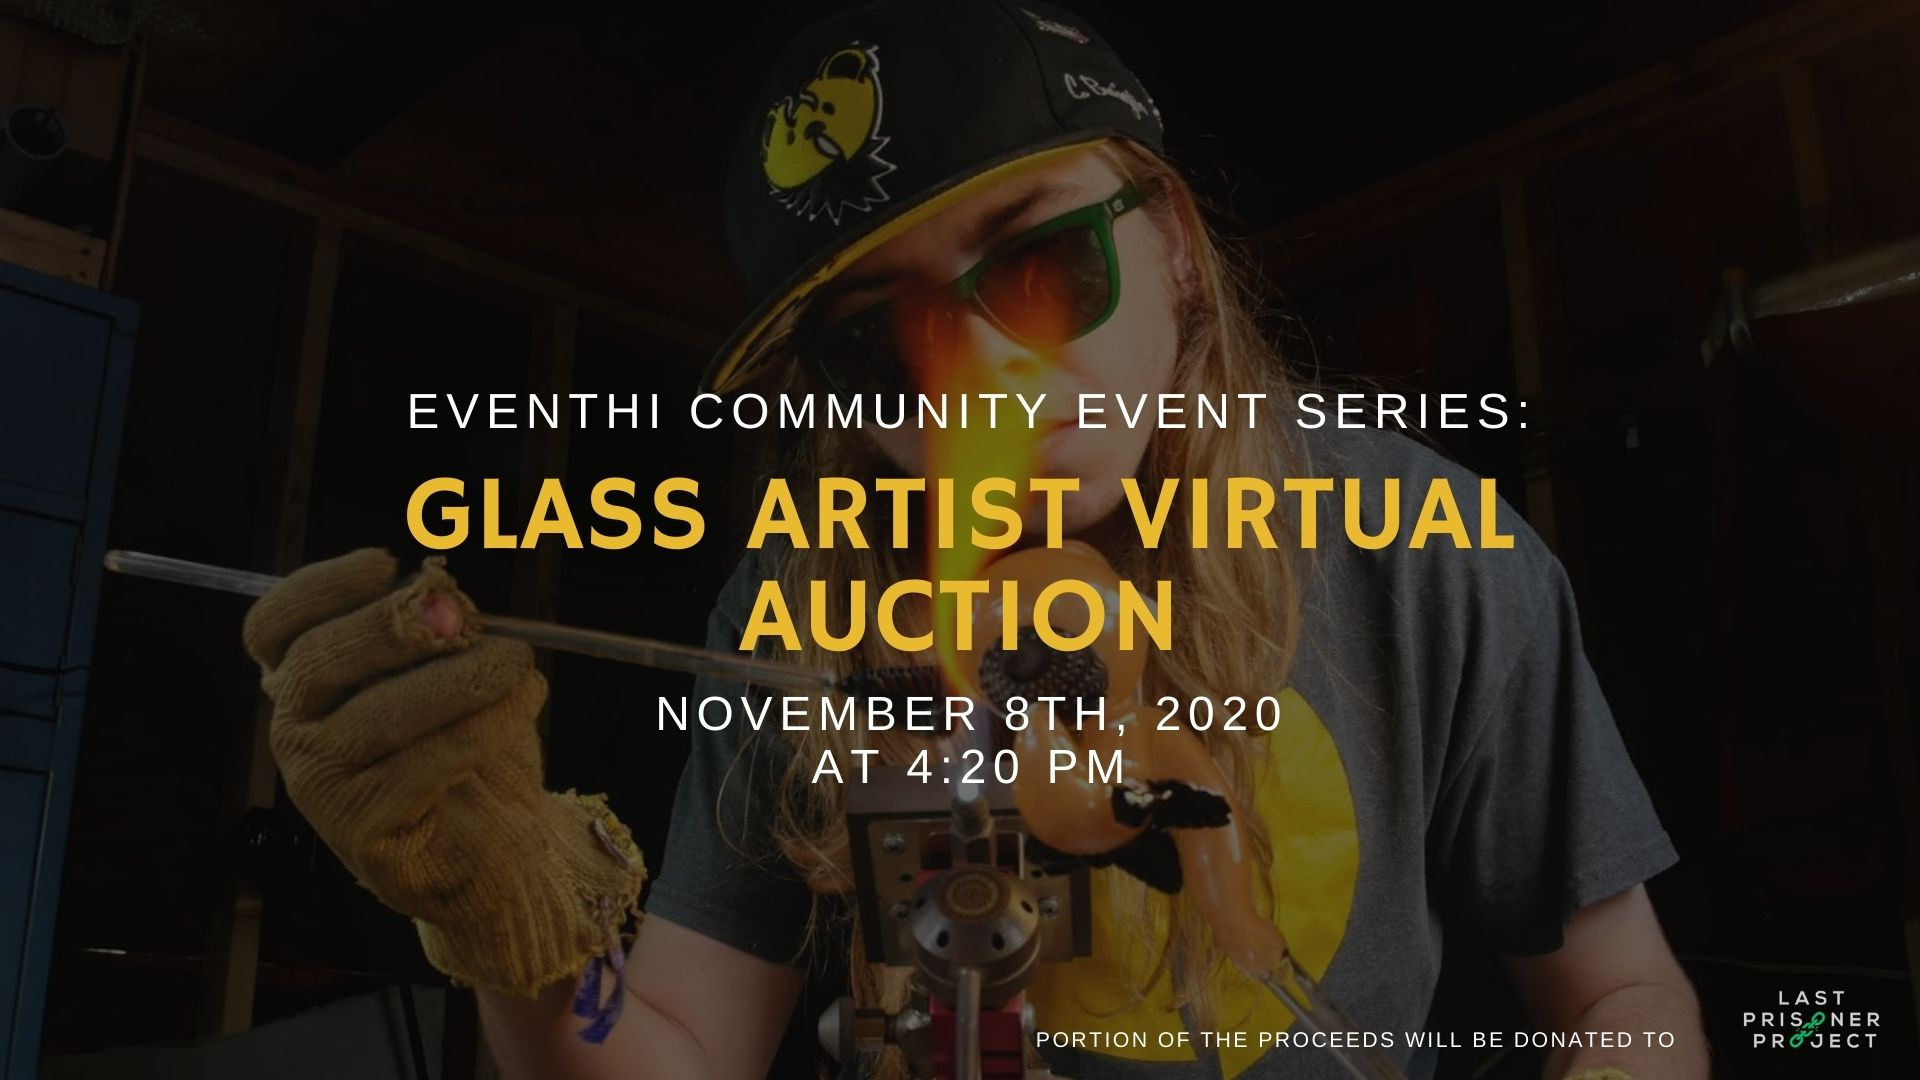 EventHi Community Event Series: Glass Art Virtual Auction